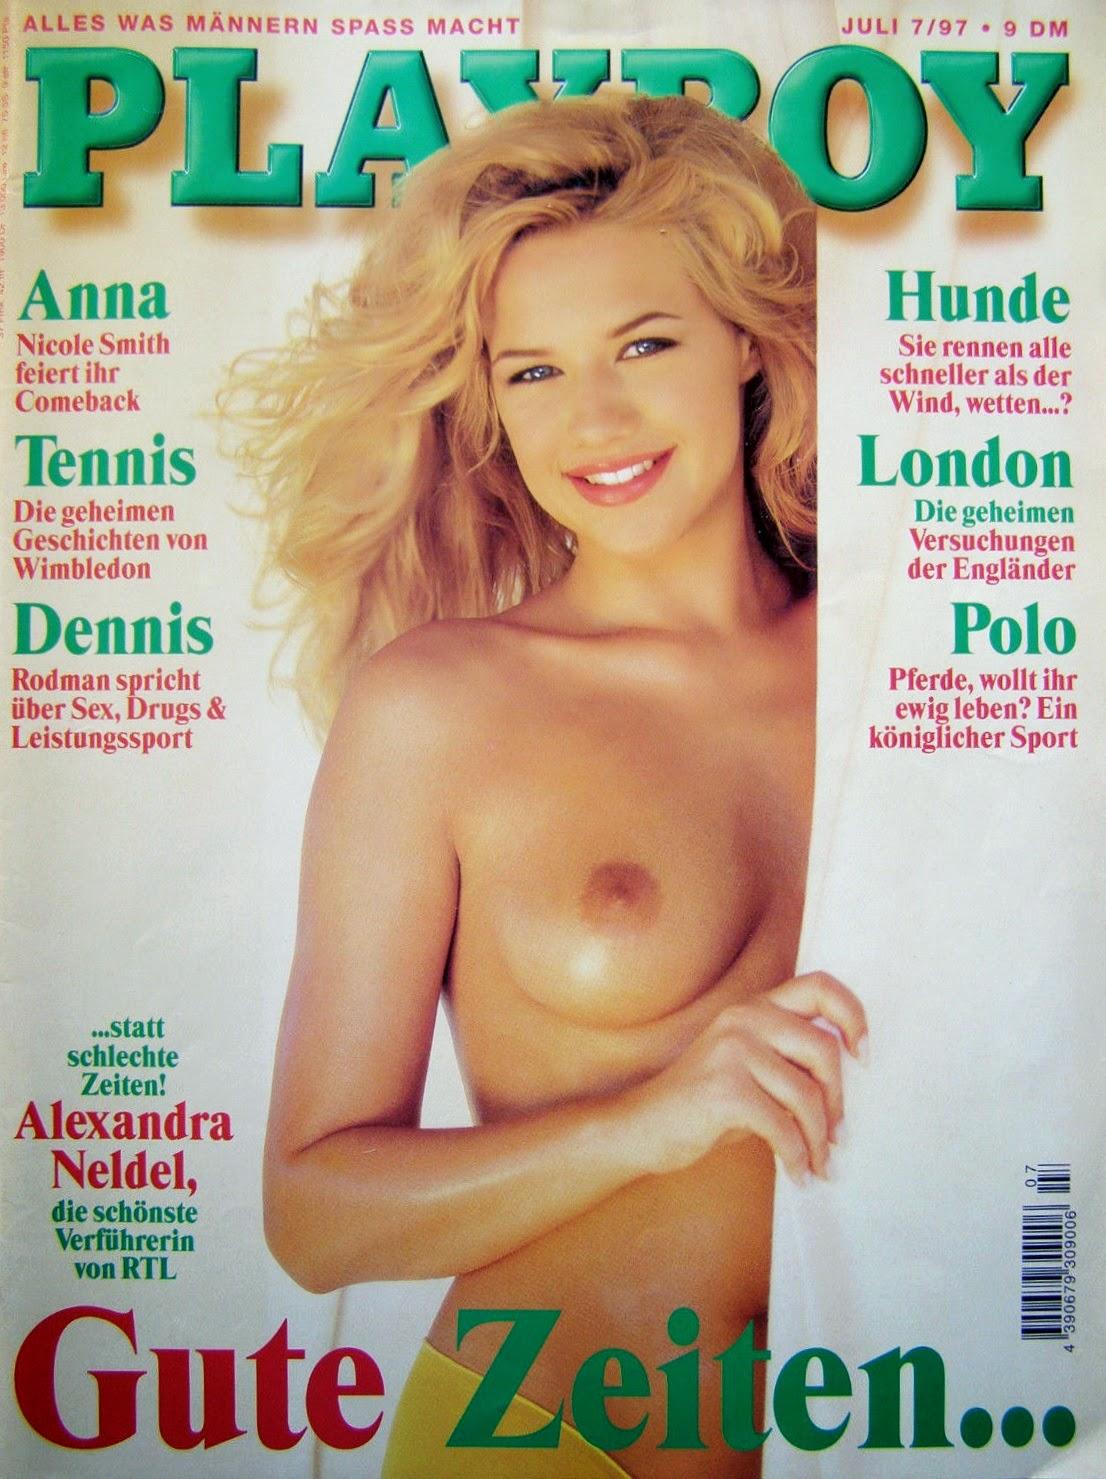 Neldel/nackt alexandra Alexandra Neldel